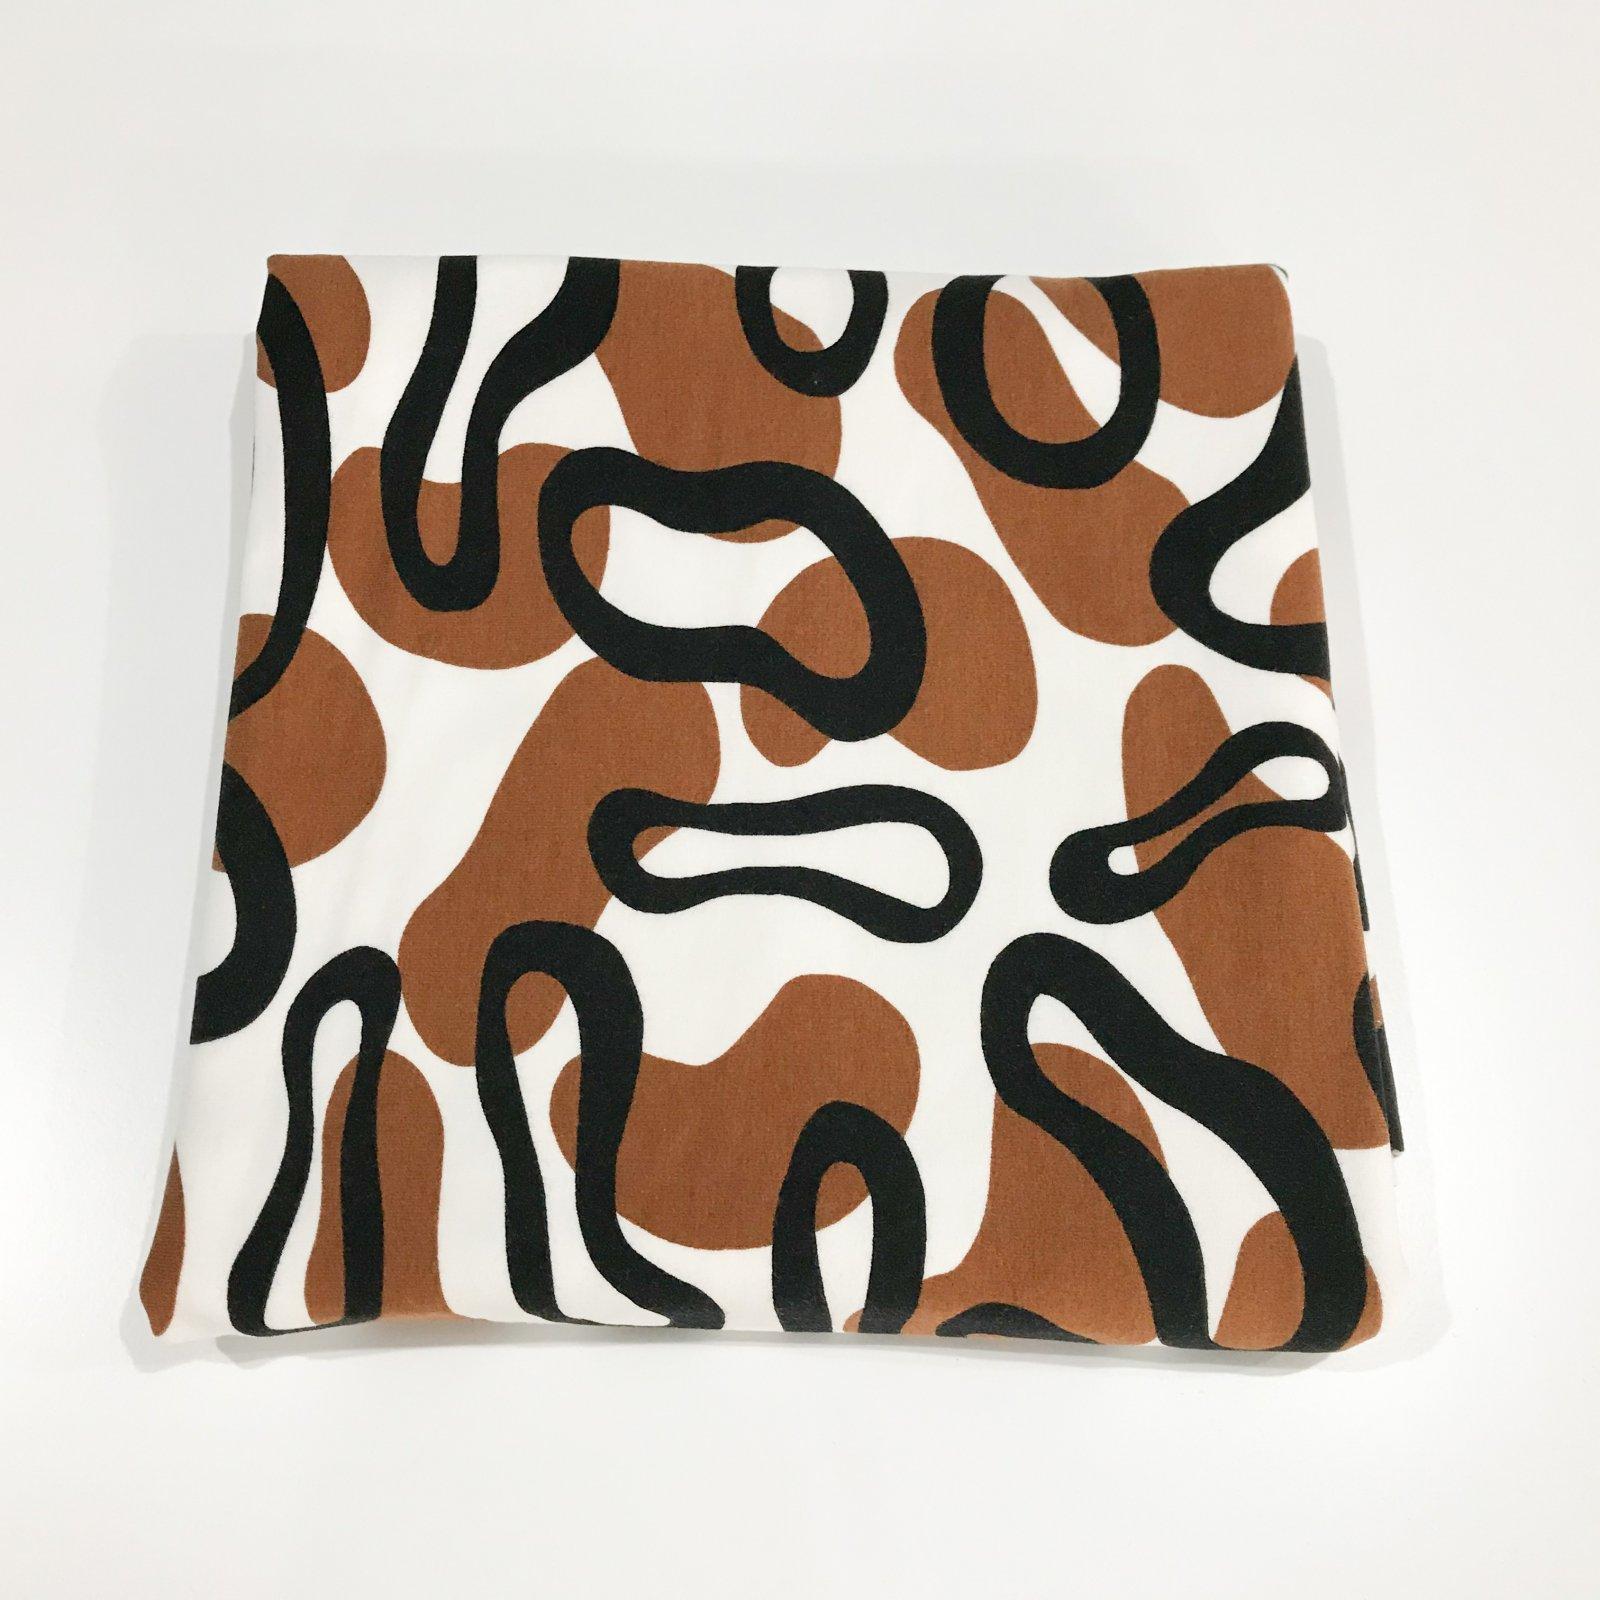 1 1/8 yard - Avalana Sweat - Animal Prints in Cream